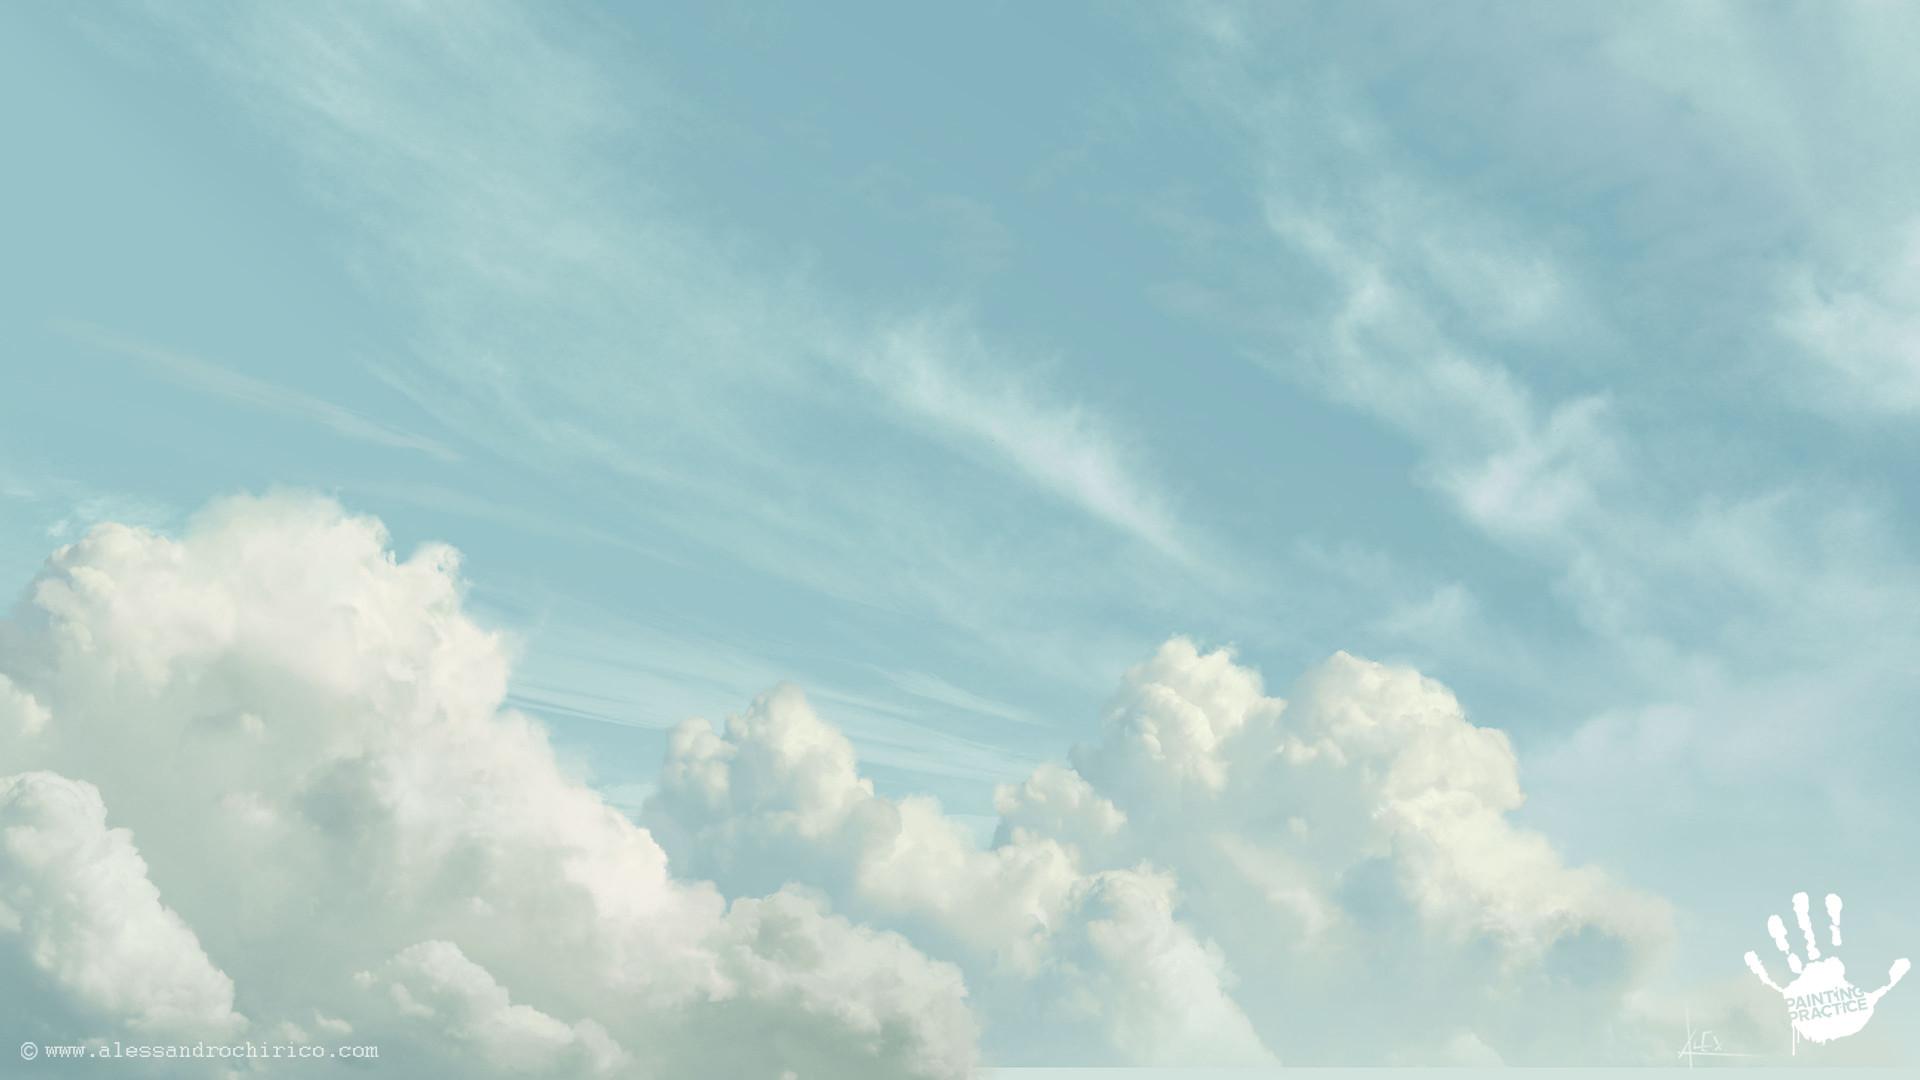 Alessandro chirico 23 sky matte alessandro chirico